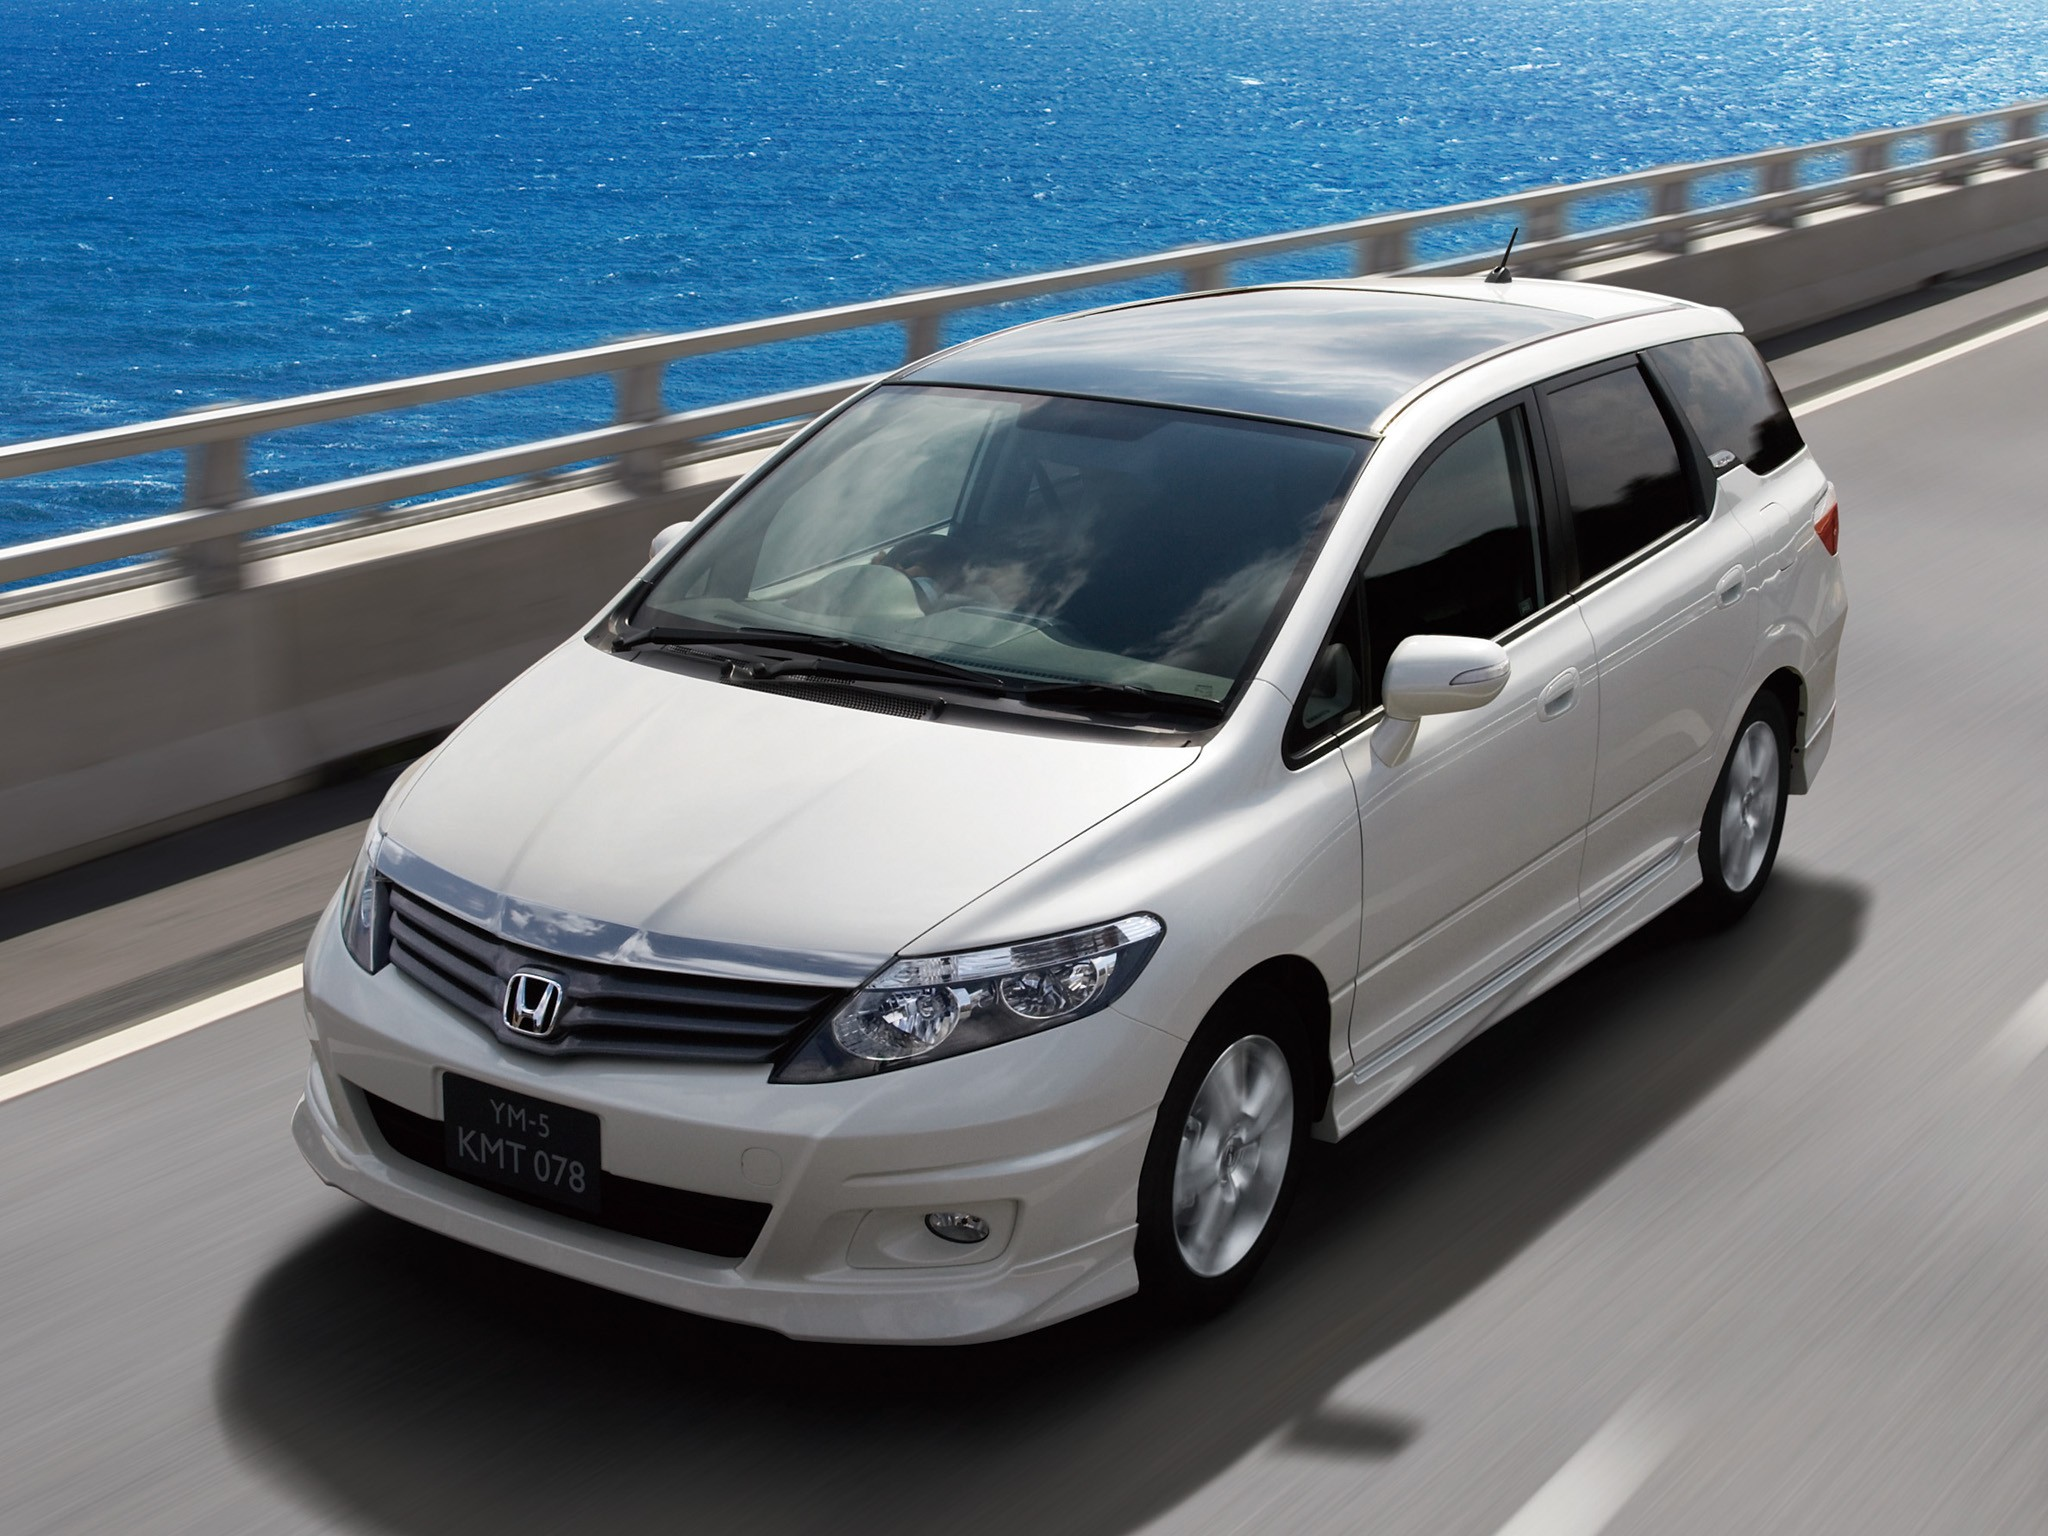 Honda Airwave 2008 - 2010 Station wagon 5 door #6